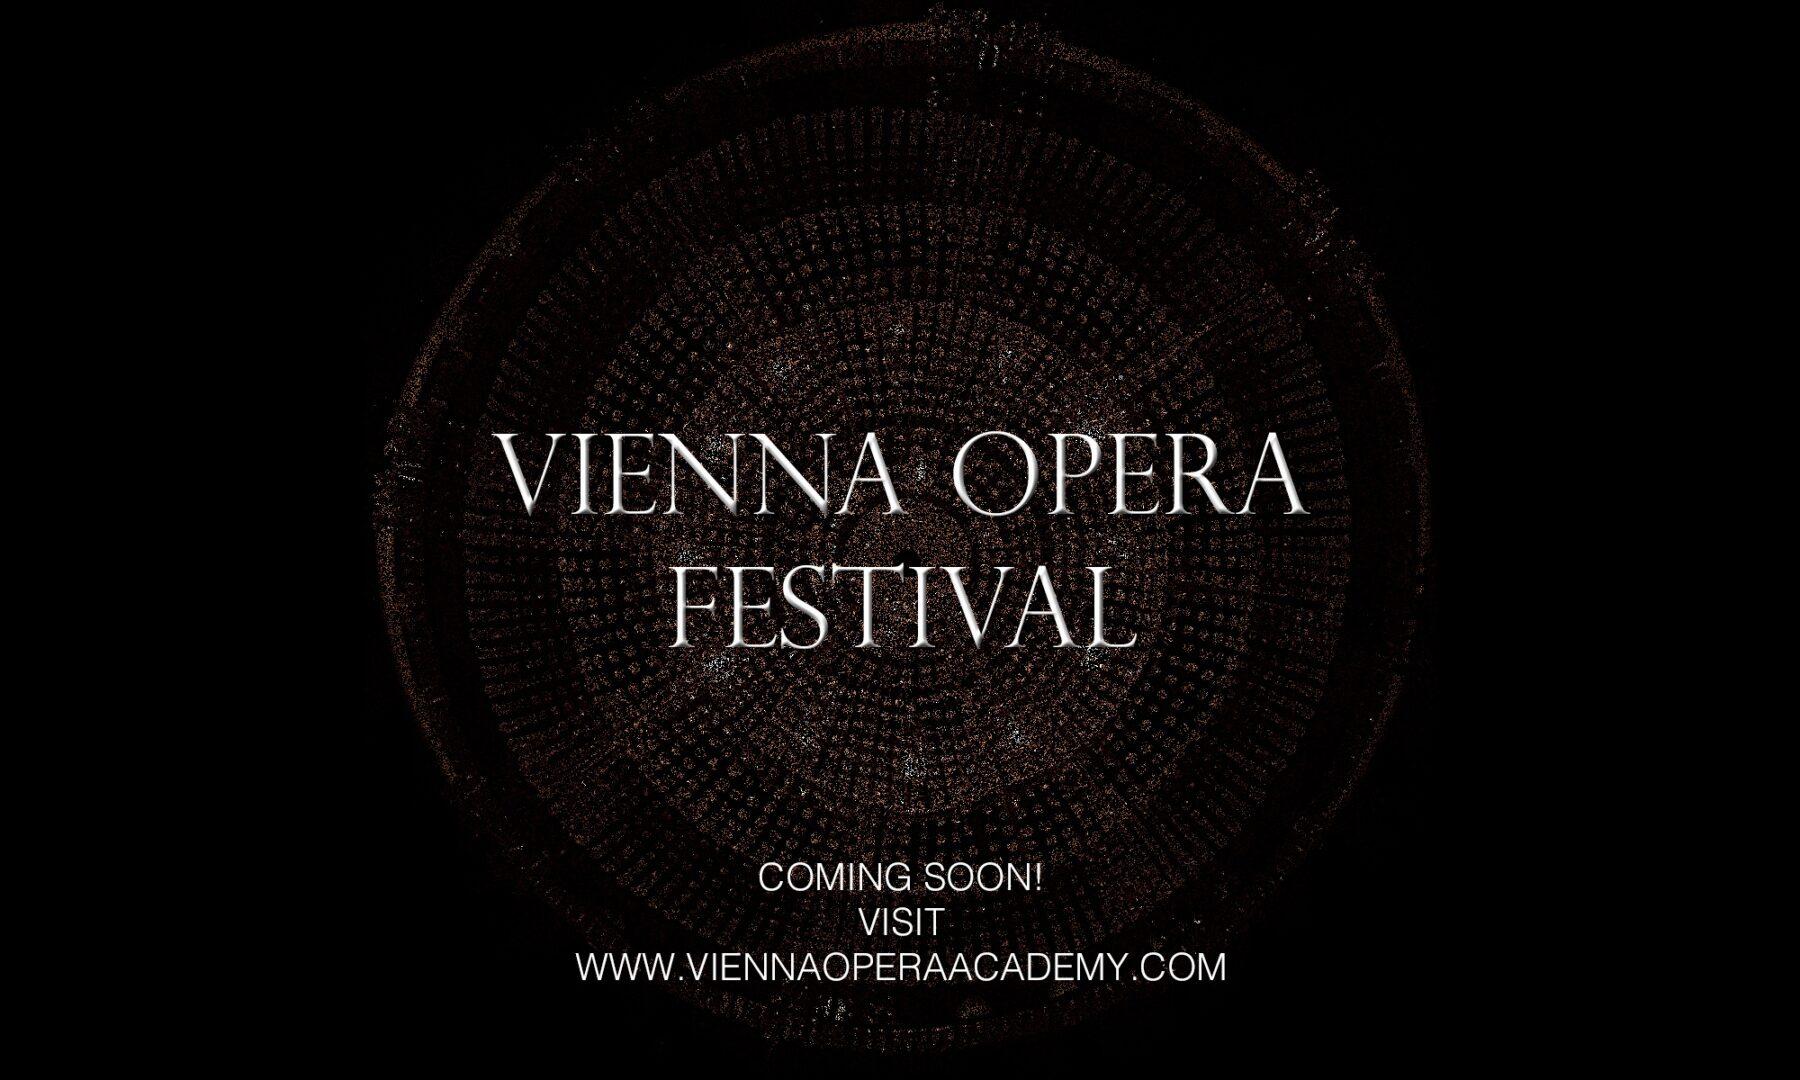 Vienna Opera Festival